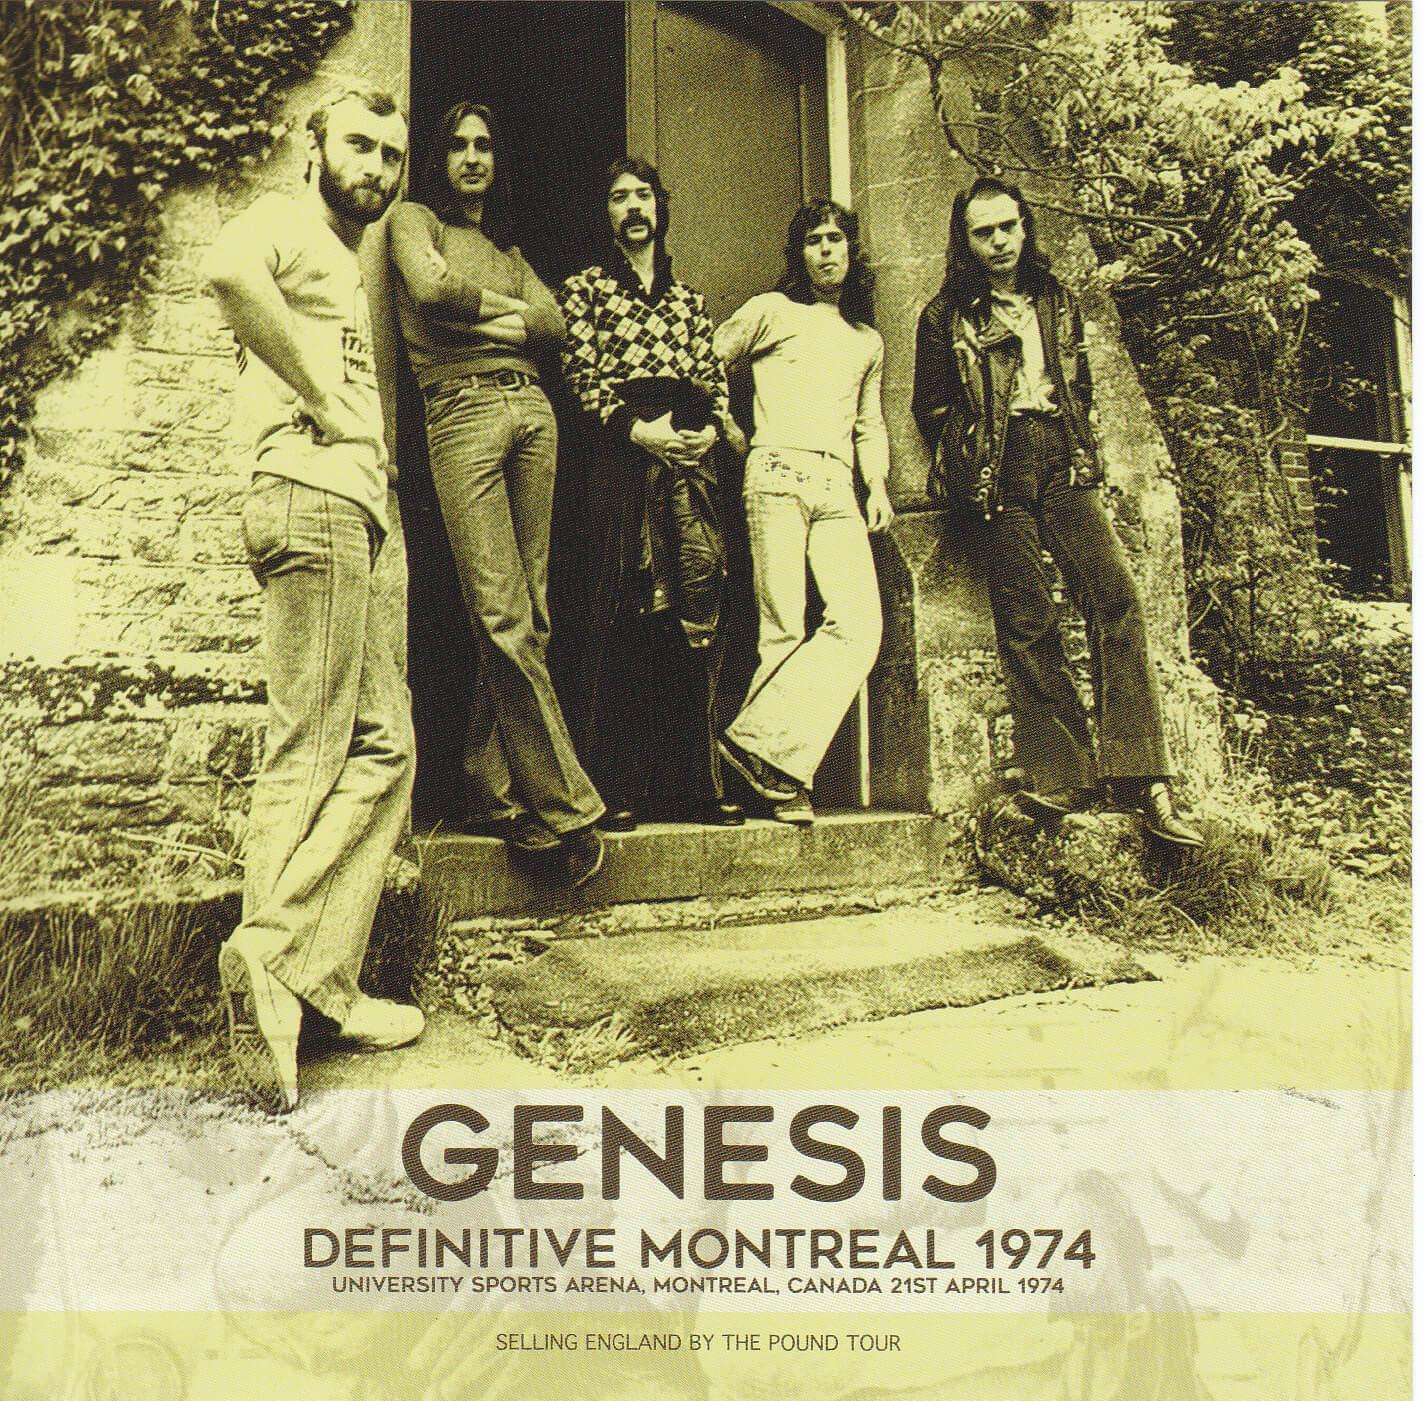 Genesis – Definitive Montreal 1974 – 2nd Press (2CD+1Bonus DVDR) Virtuoso 268/269 | DiscJapan